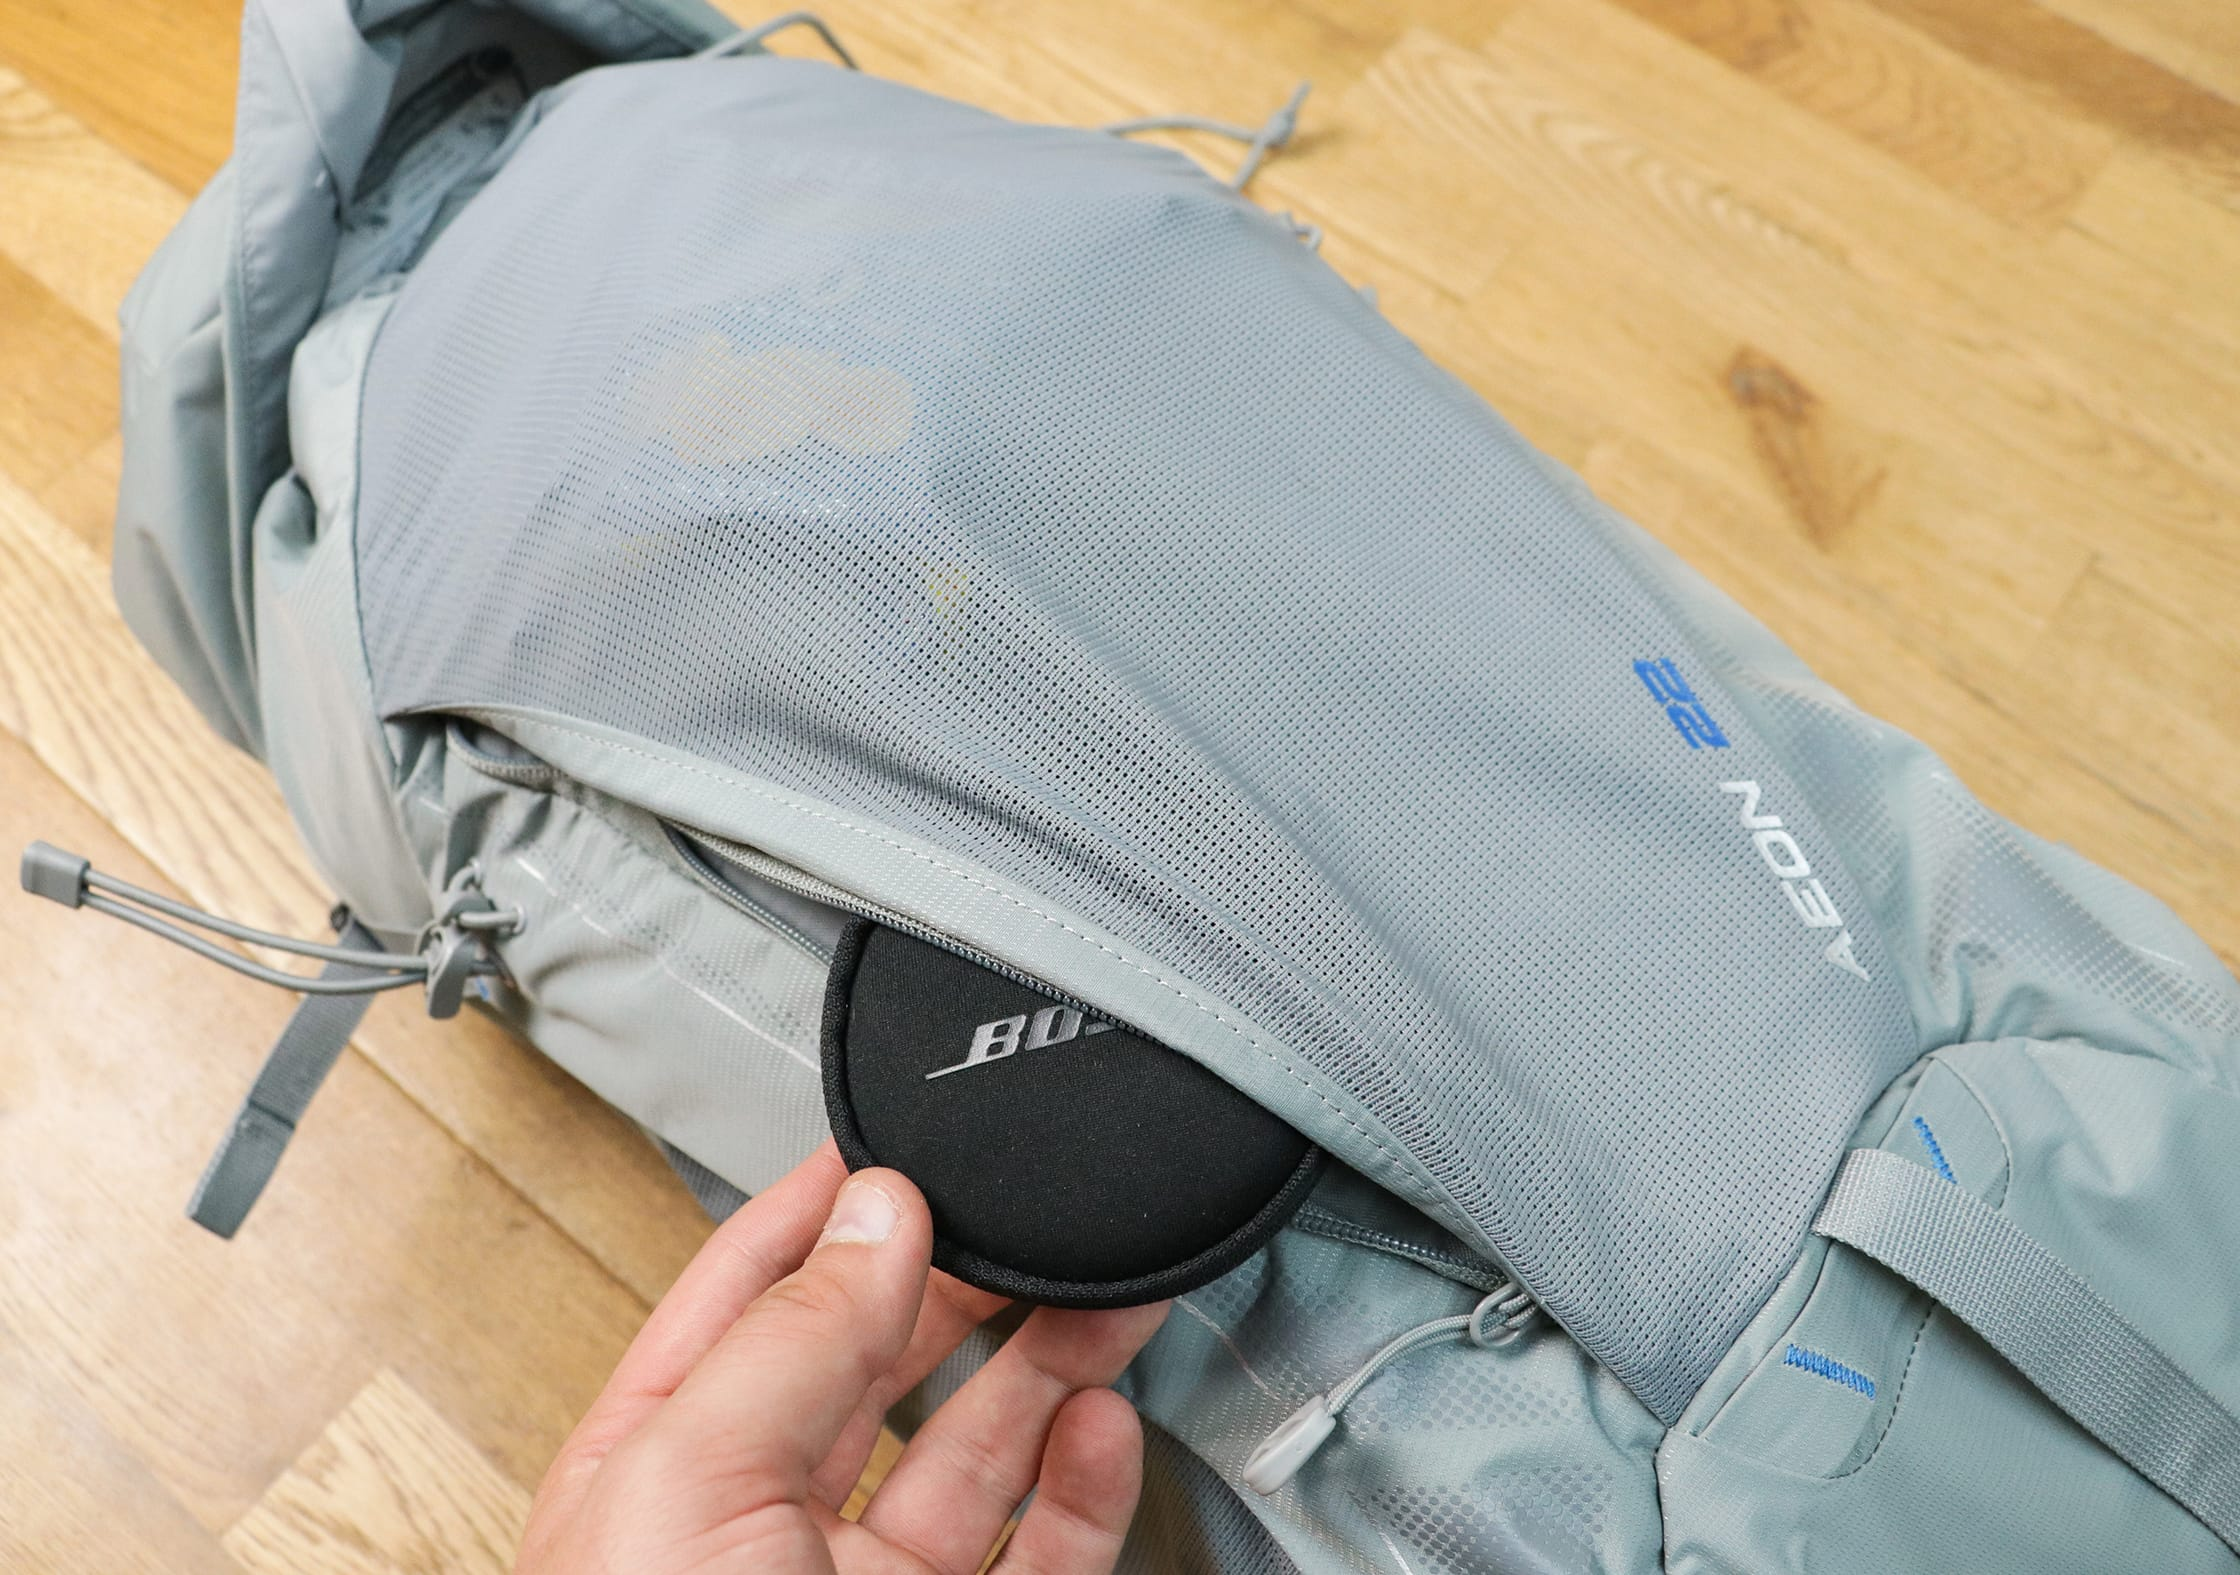 Lowe Alpine Aeon Front Stretchy Mesh Pocket